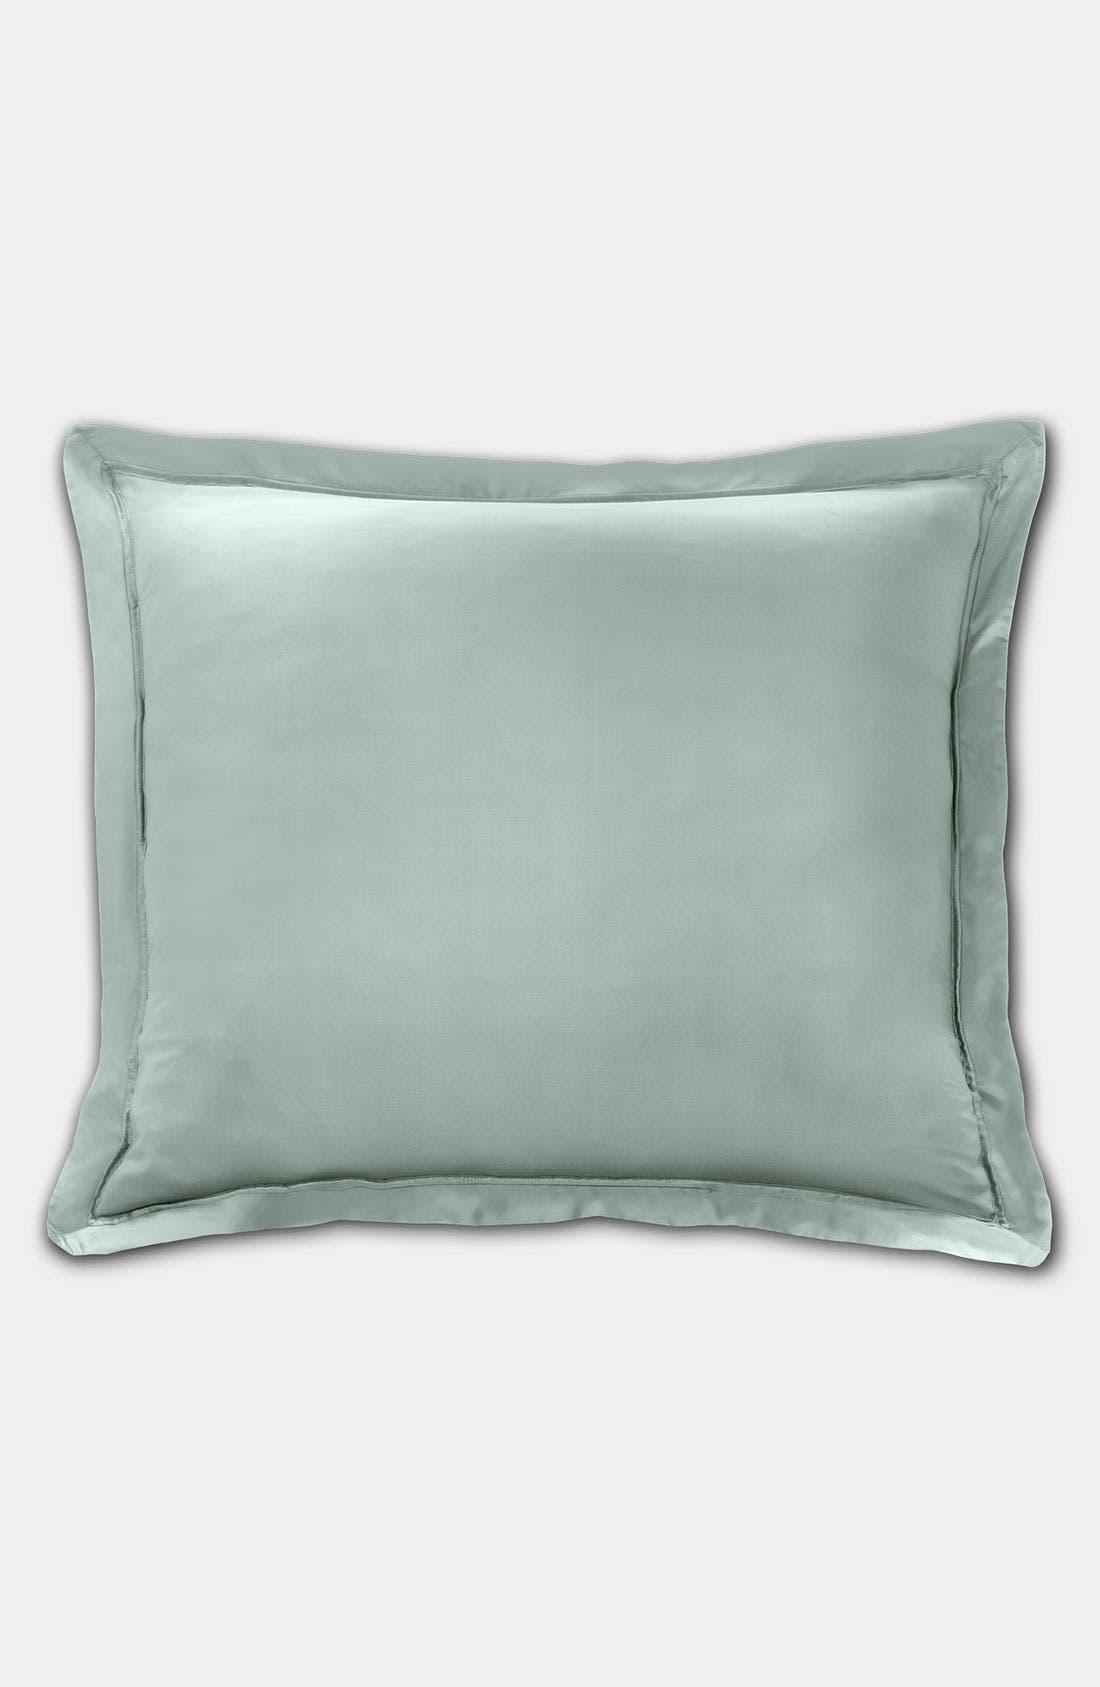 Main Image - Donna Karan 'Lustre Seam' Euro Pillow Sham